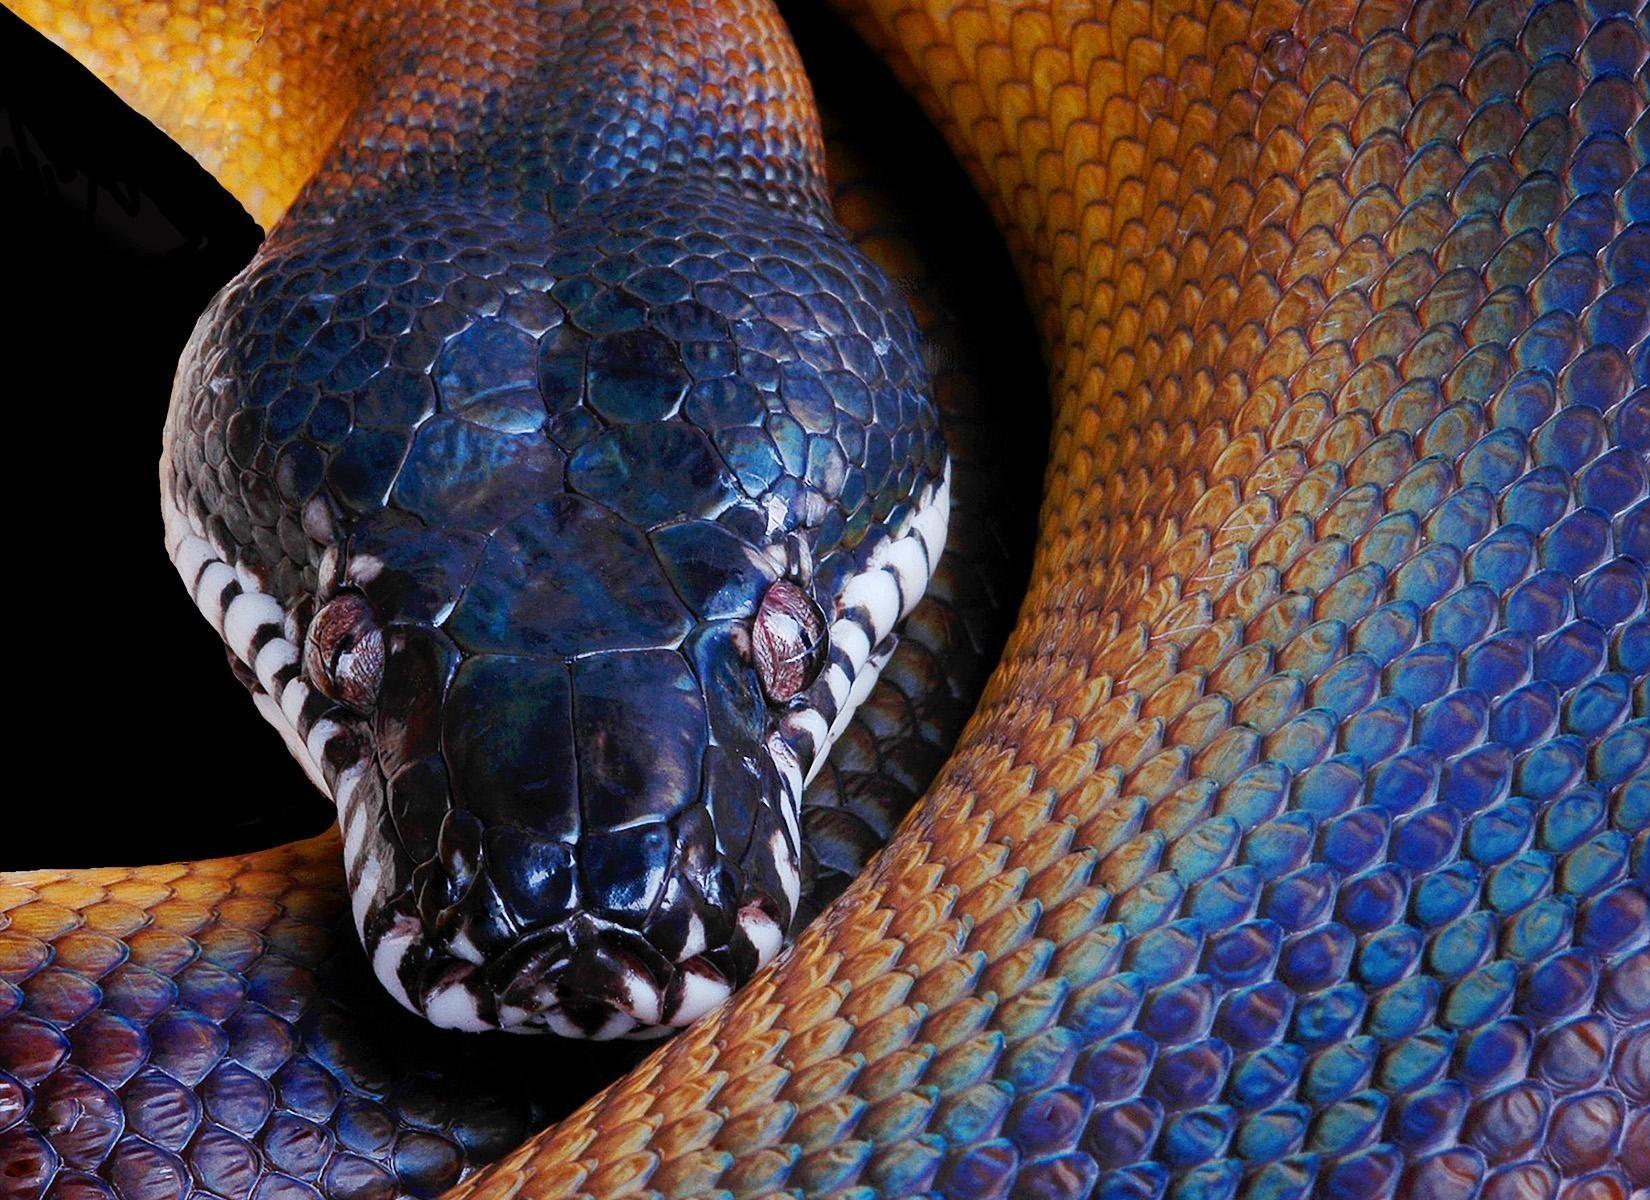 Змеи картинки для компании